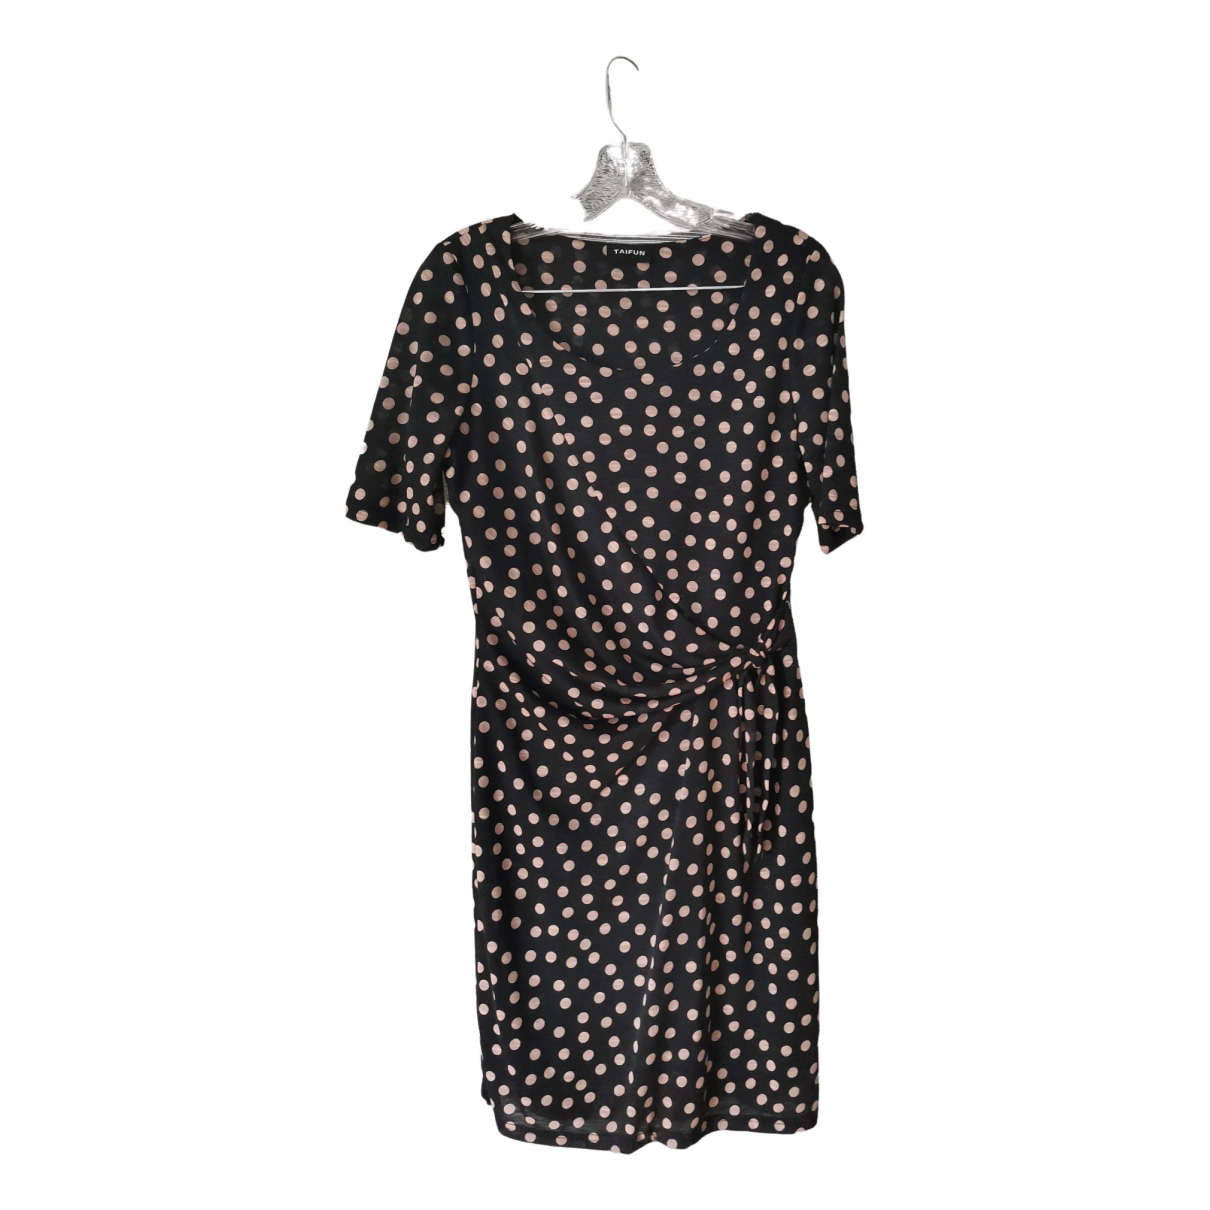 Non Signé / Unsigned Hippie Chic Black Cotton - elasthane dress for Women M International